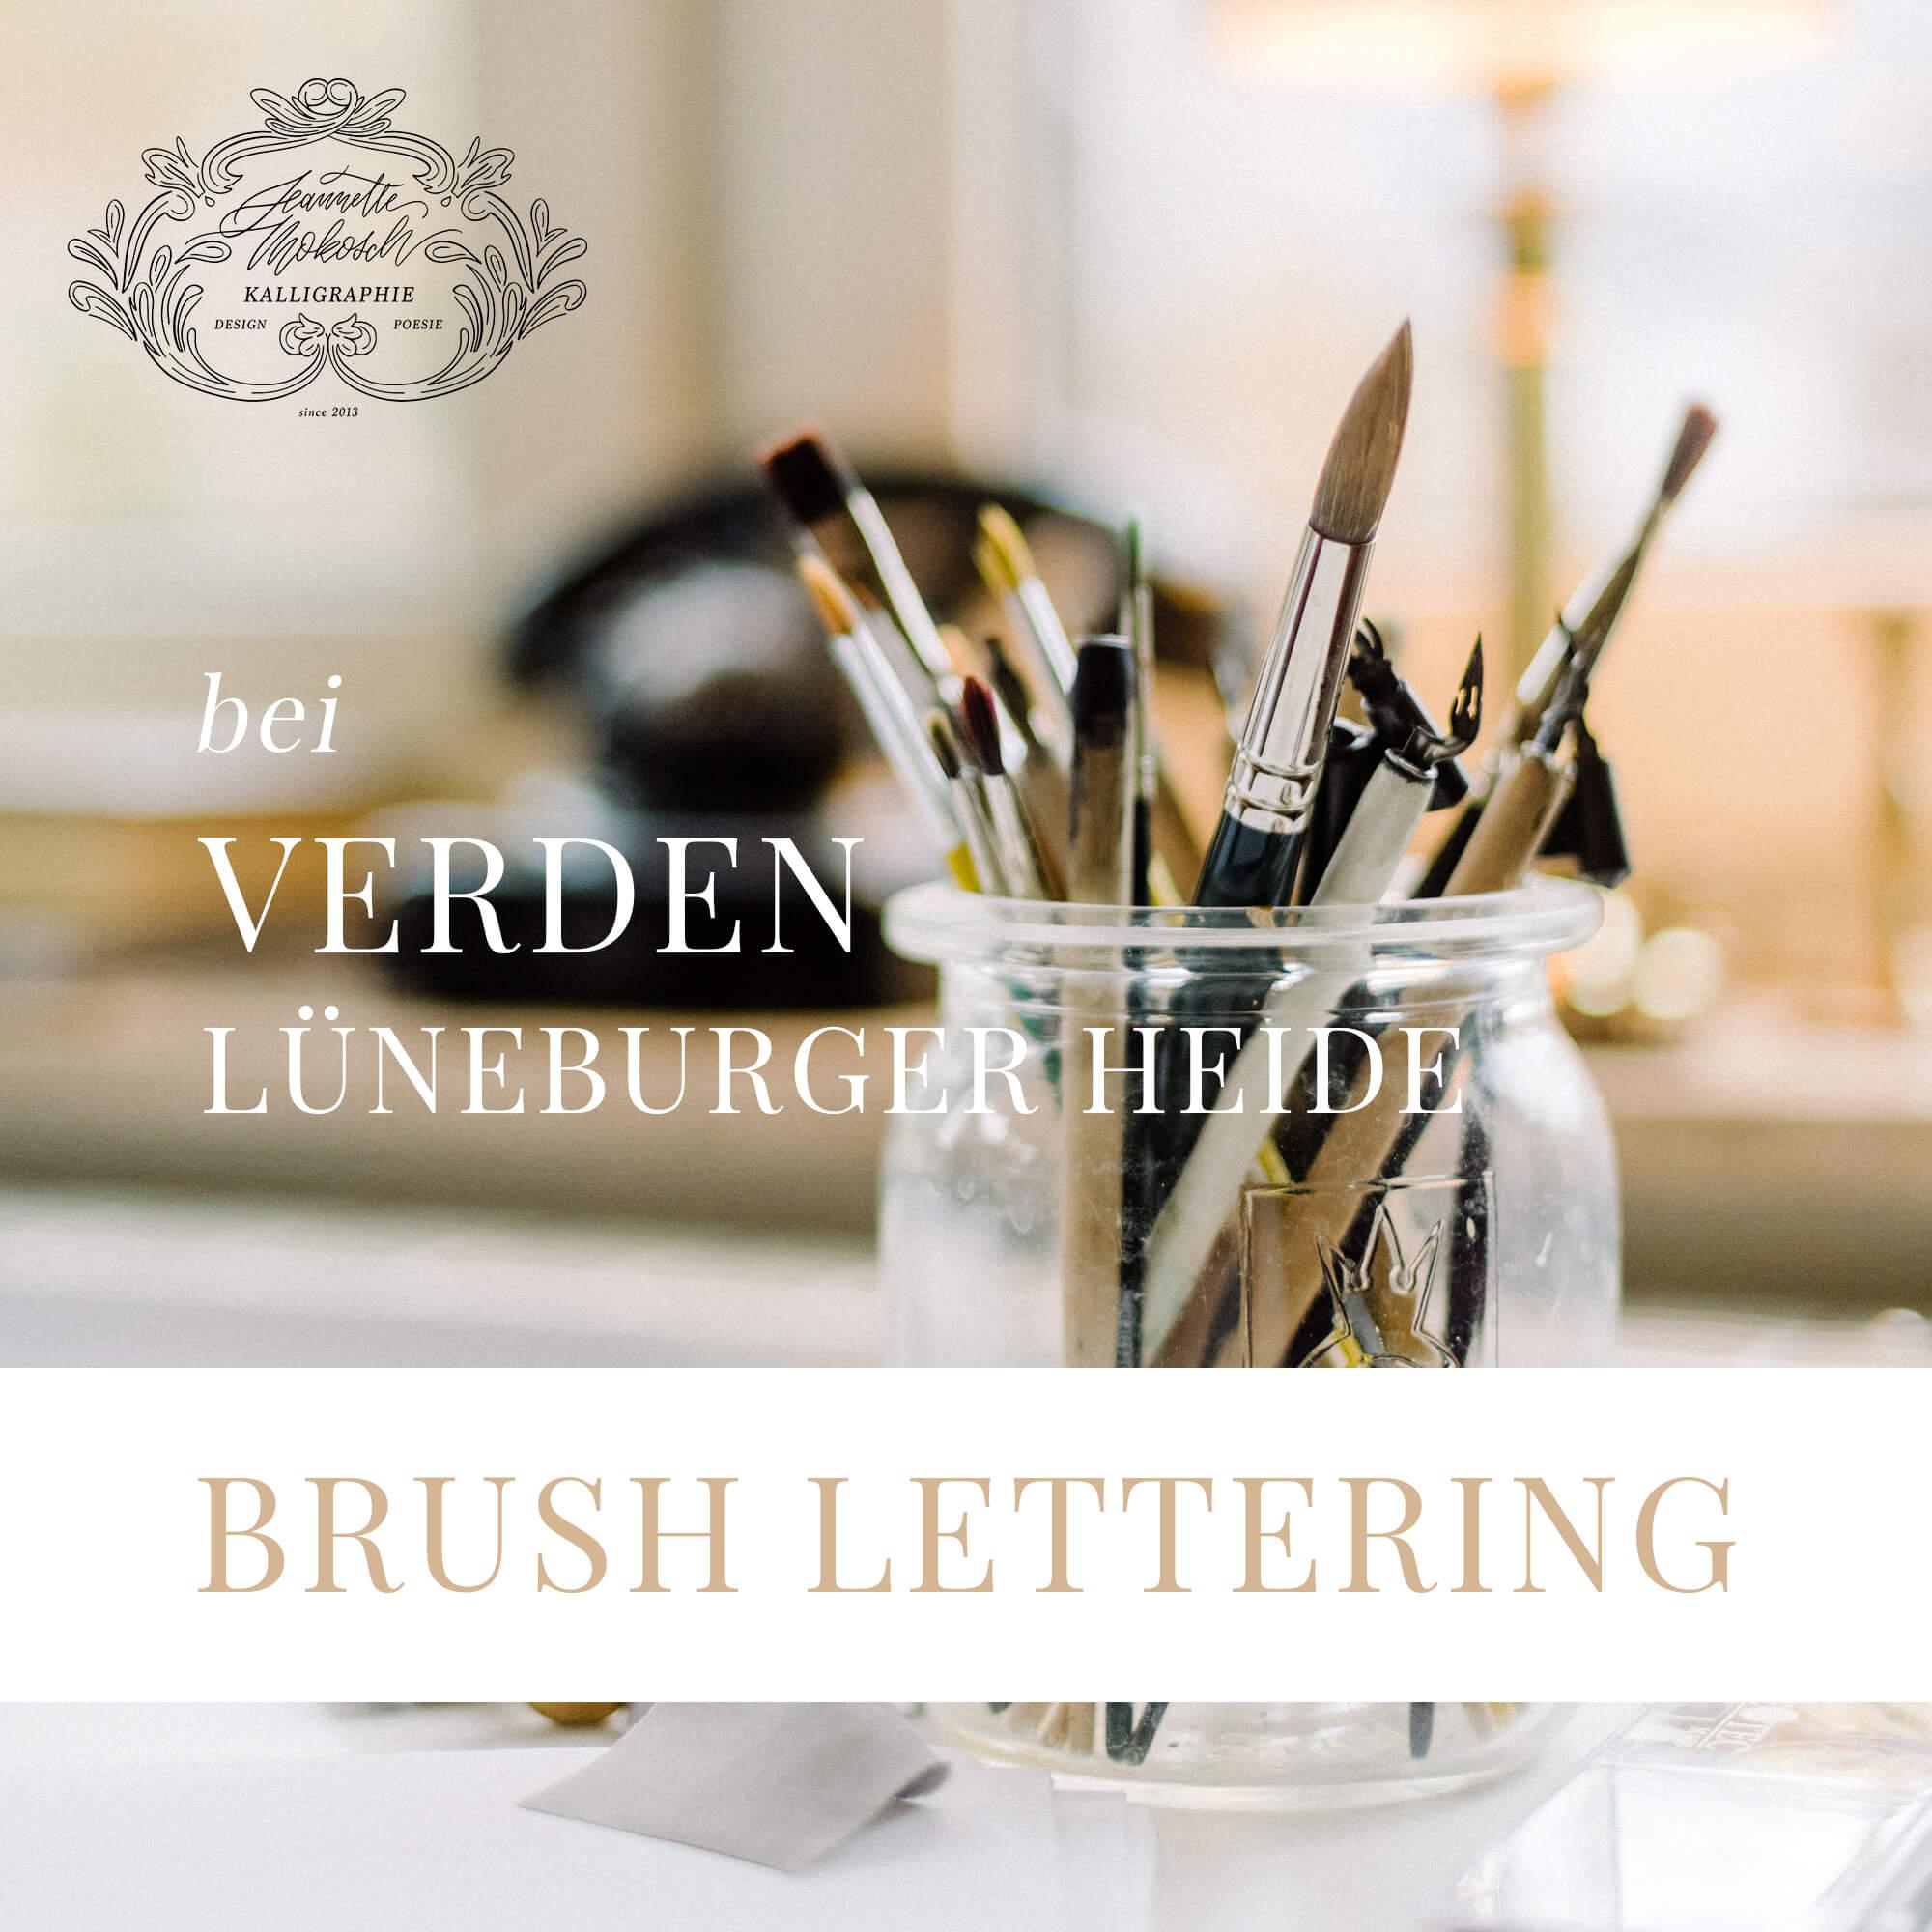 Workshop Kalligraphie Kurs Anfänger Verden Niedersachsen Hannover Hamburg Kalligrafie Hand Lettering Brushlettering Schönschrift Buch Füller Feder Moderne Kalligrafie